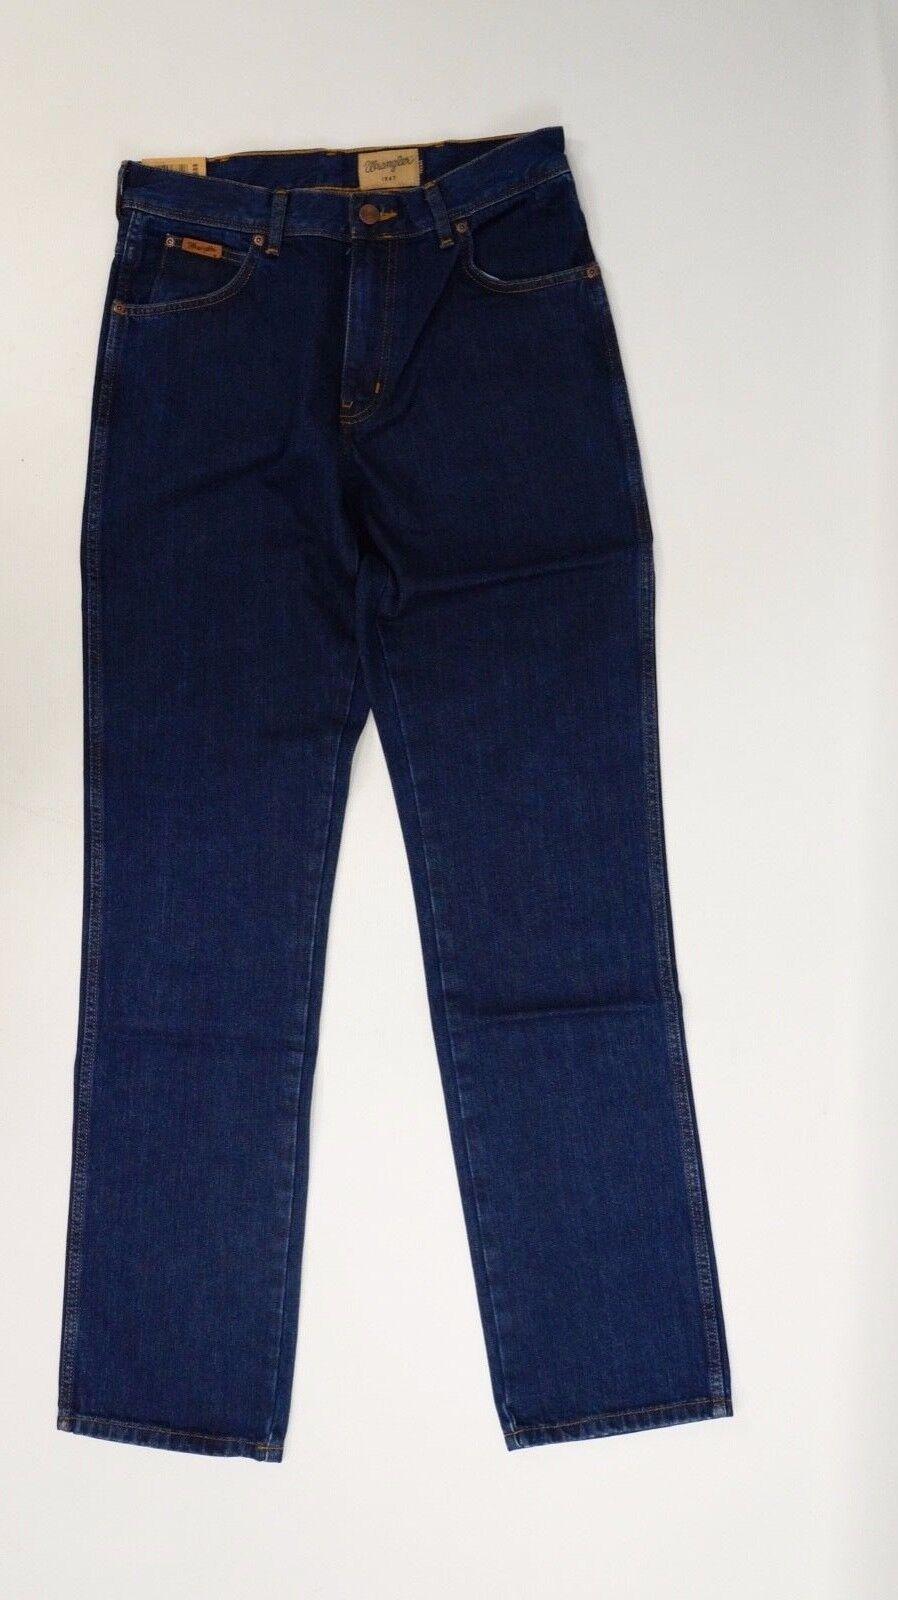 WRANGLER Uomo Jeans Pantaloni Texas Regular Darkstone NUOVO Blu Scuro Taglia 32 36  1347